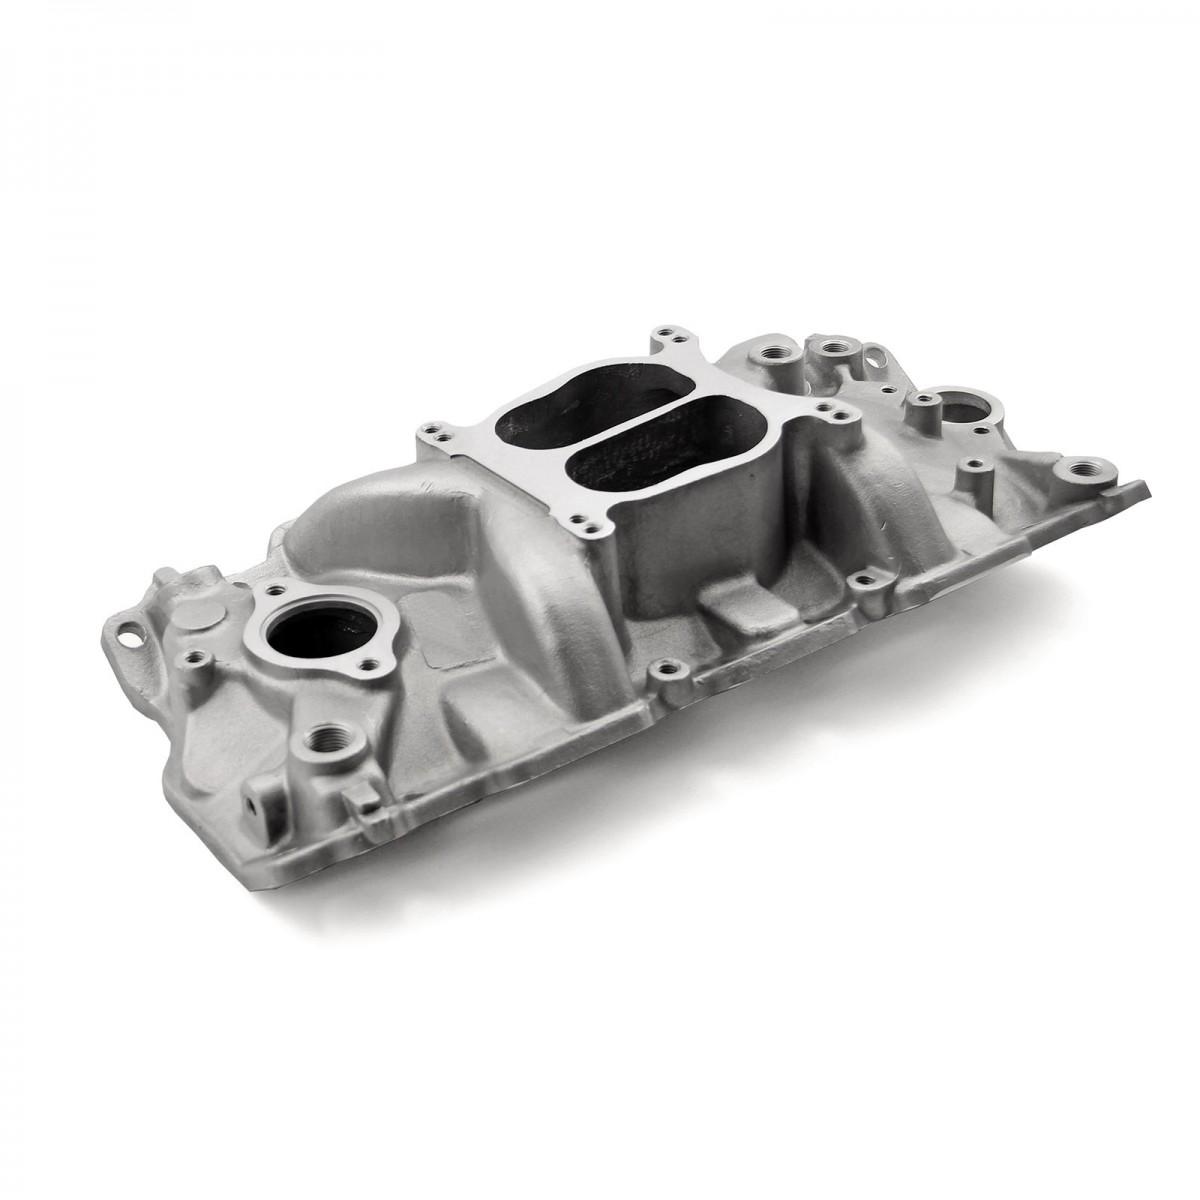 Chevy SBC 350 Holeshot 1957-95 (Non Egr) Intake Manifold Satin